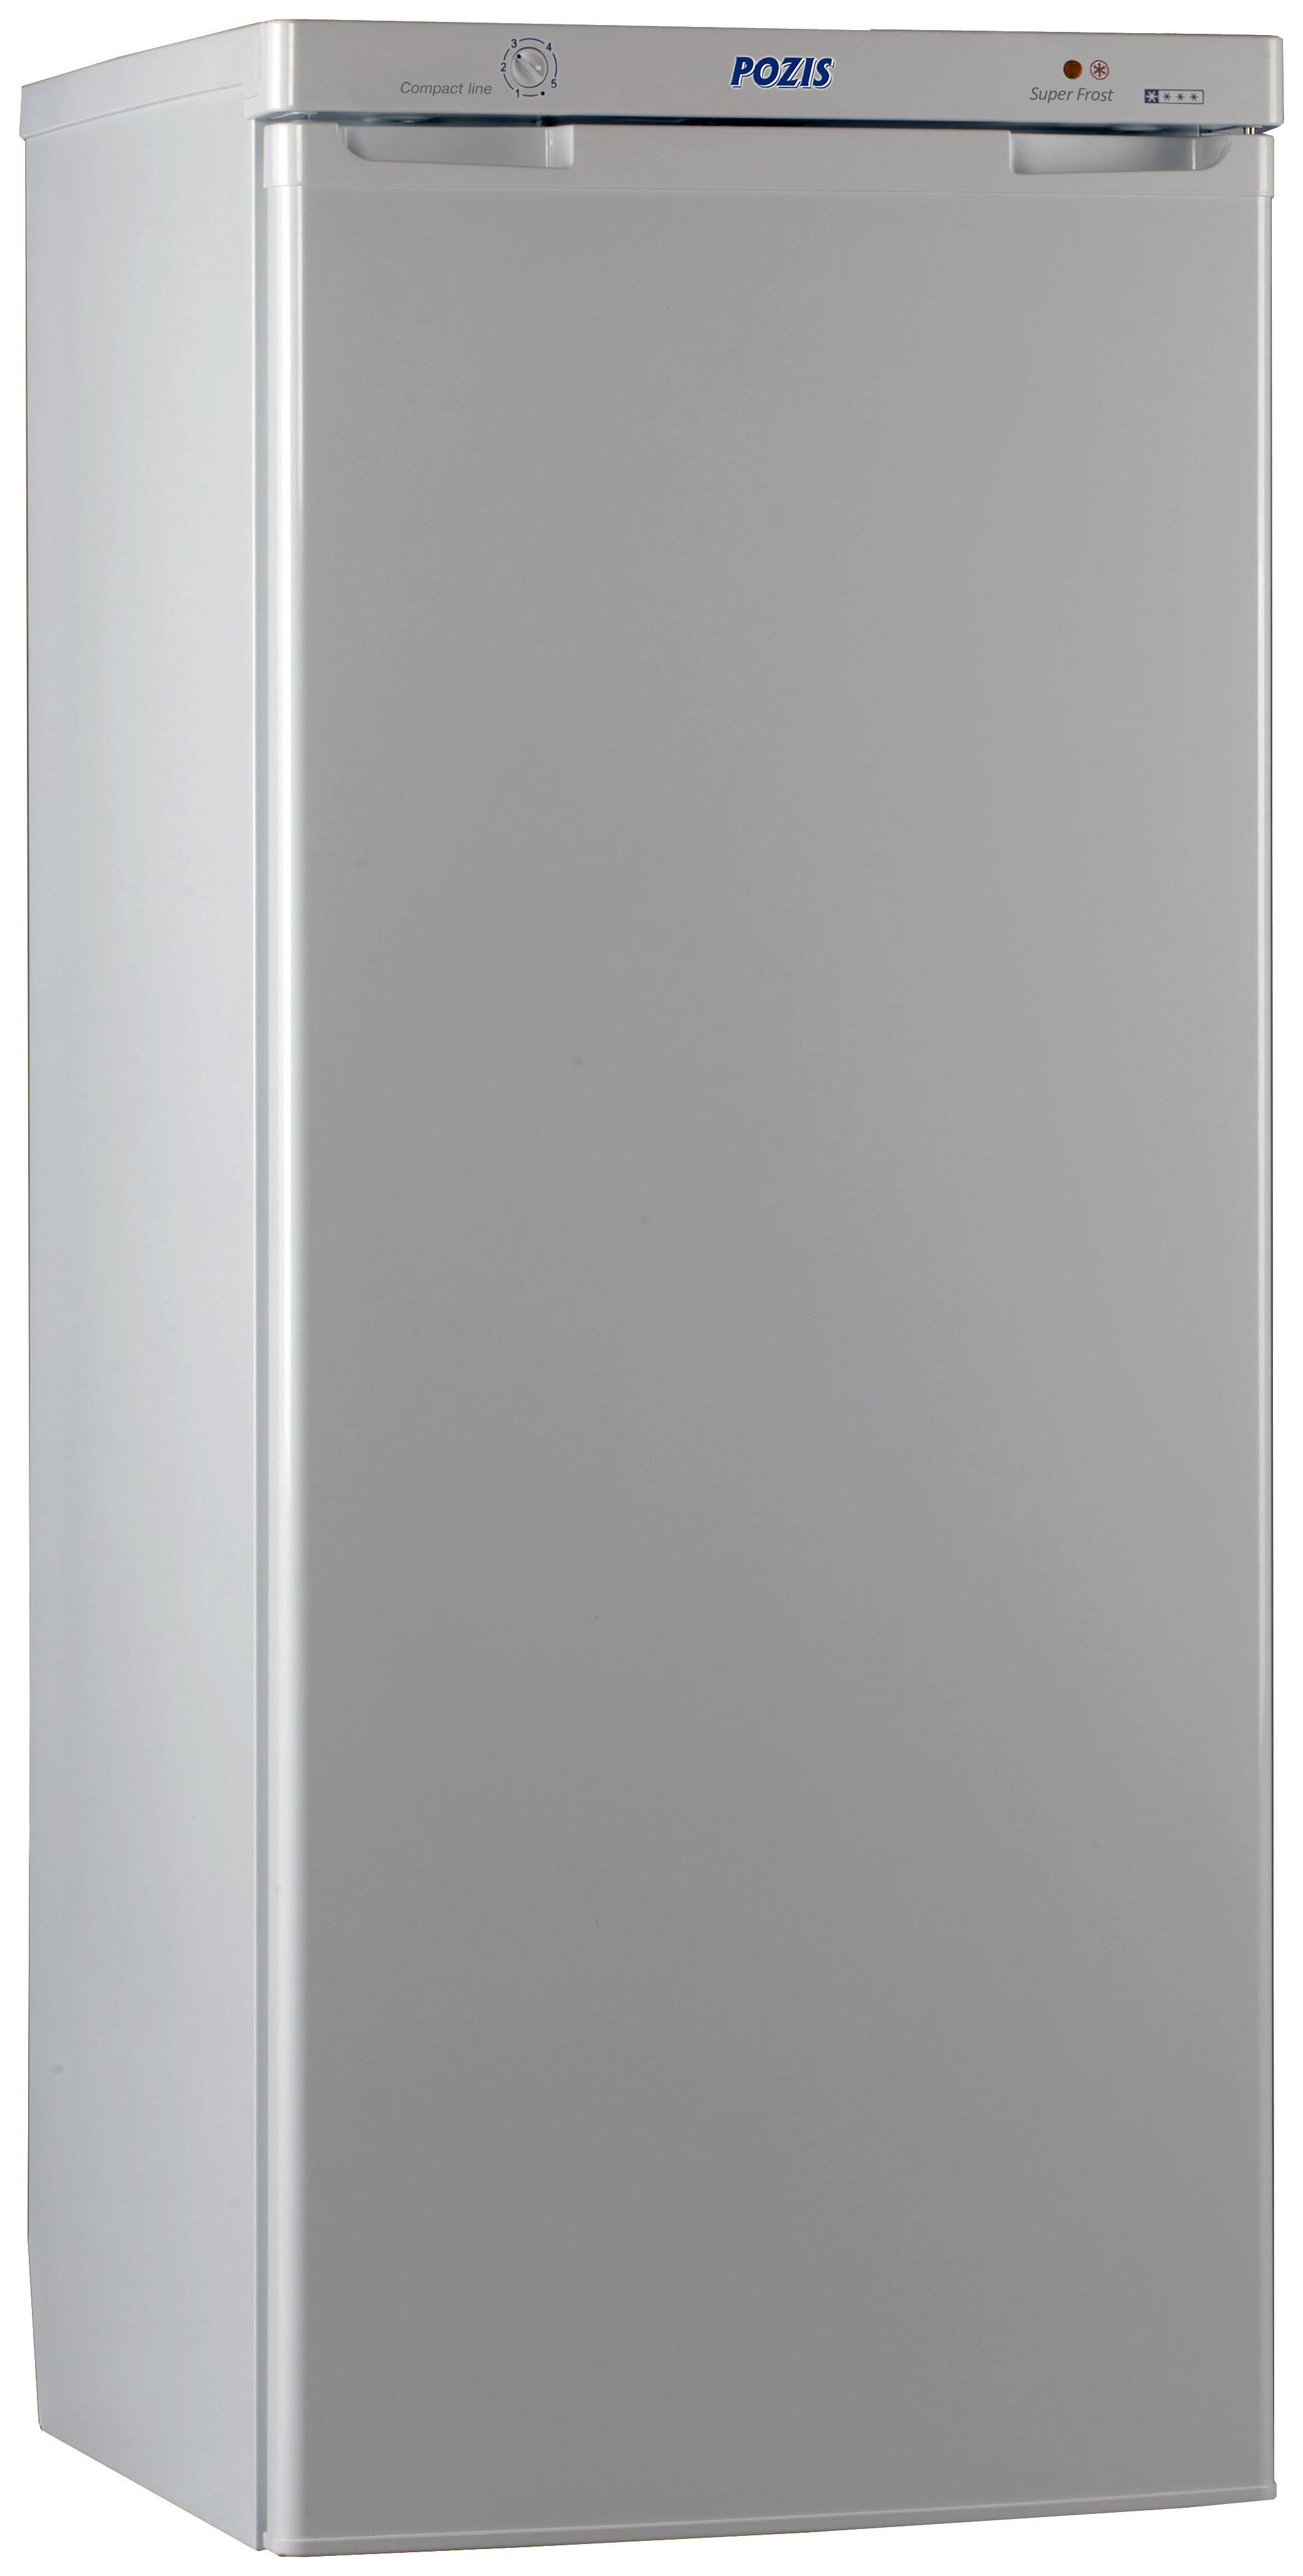 Морозильная камера POZIS FV 115 C Silver